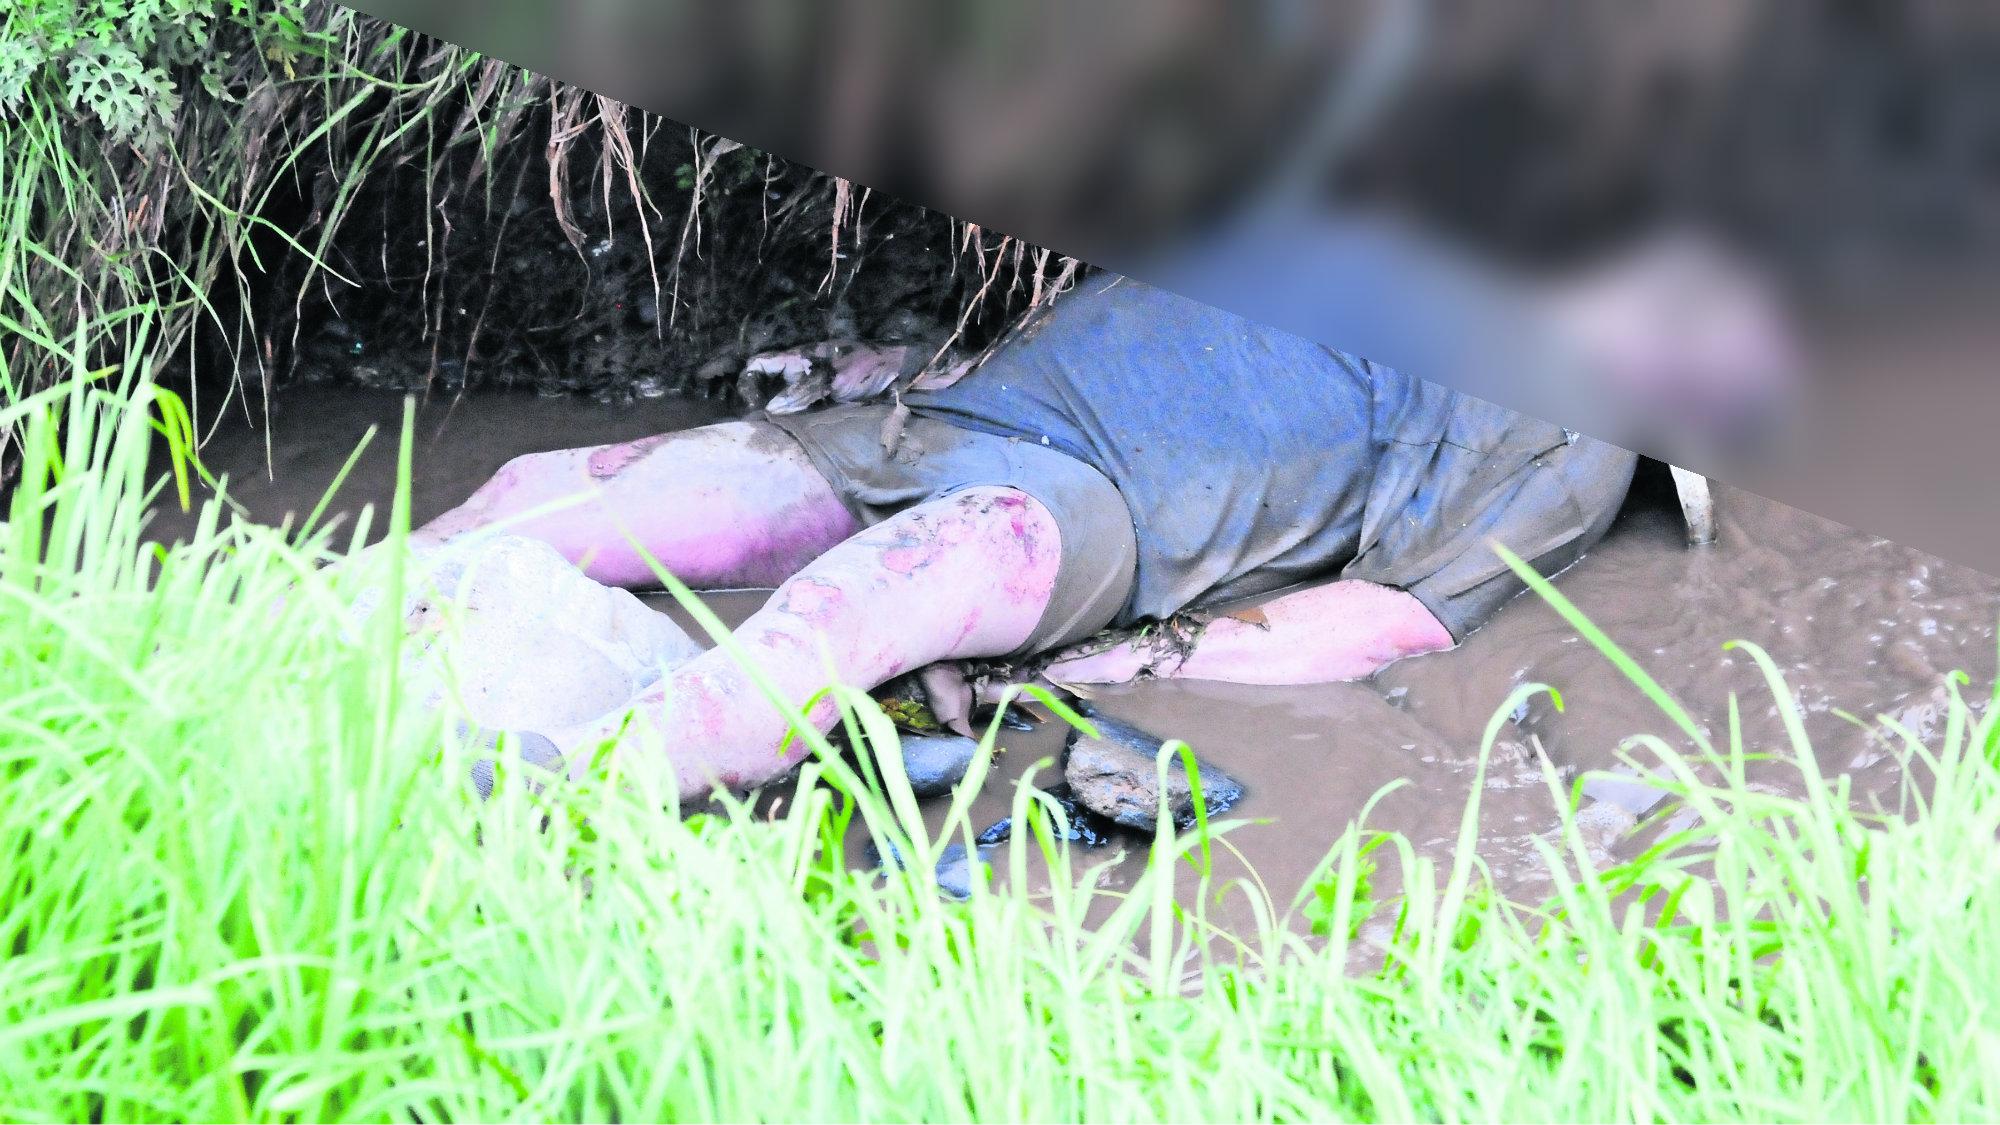 Hallan cadáver Sin identificar Canal Aguas residuales Edomex Toluca